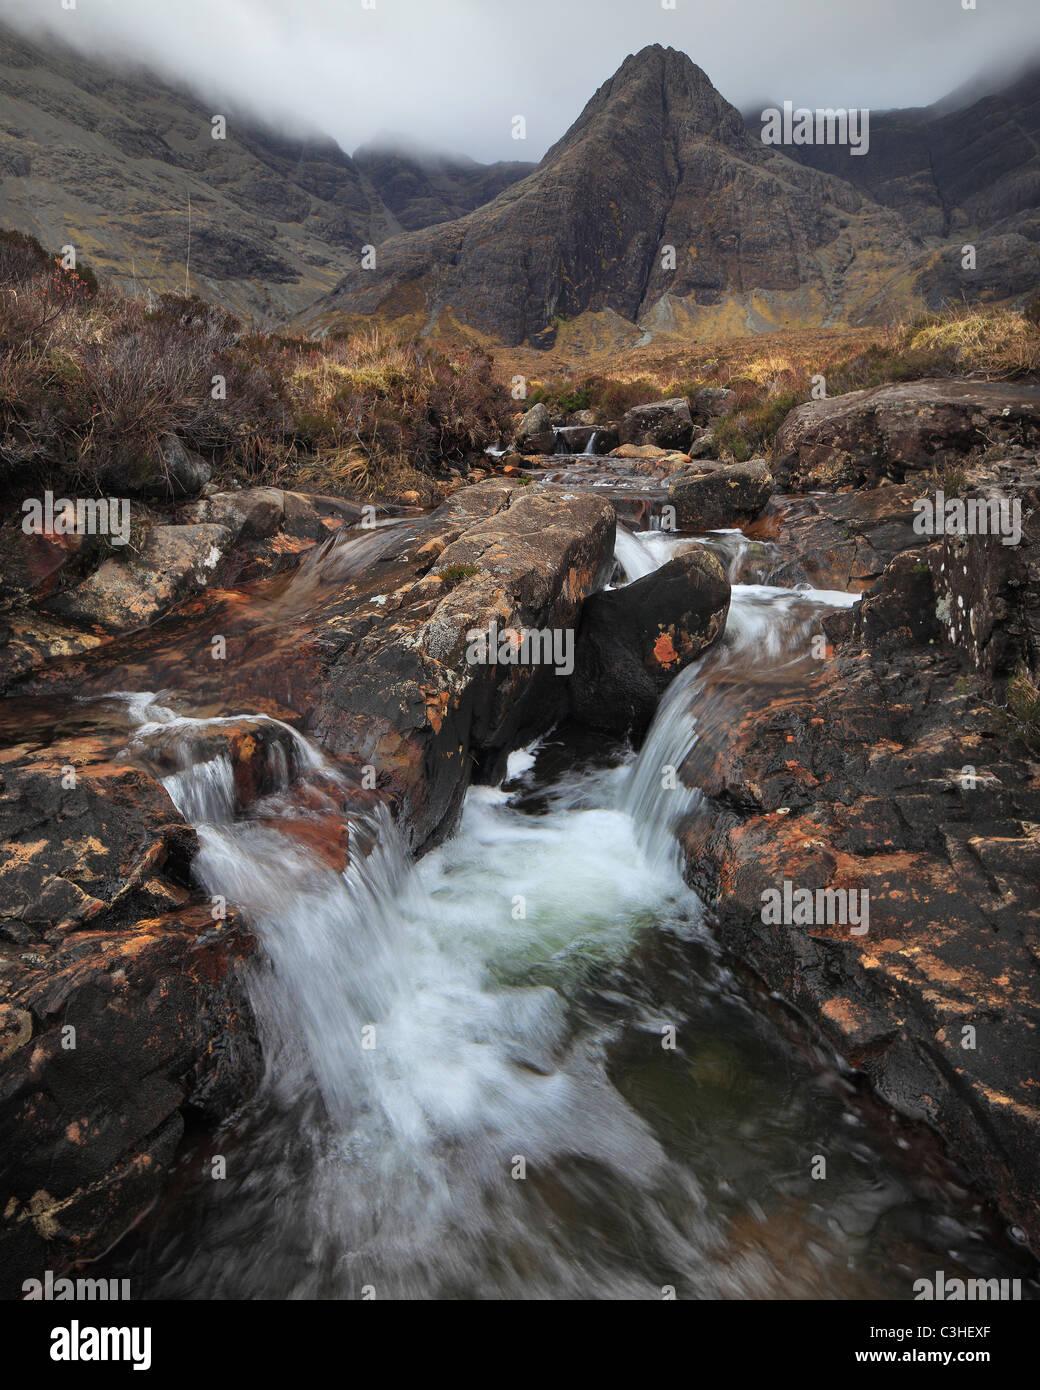 Fairy Pools along Alt Coir a Mhadaidh below Sgurr an Fheadaih in Glen Brittle on the Isle of Skye in Scotland - Stock Image